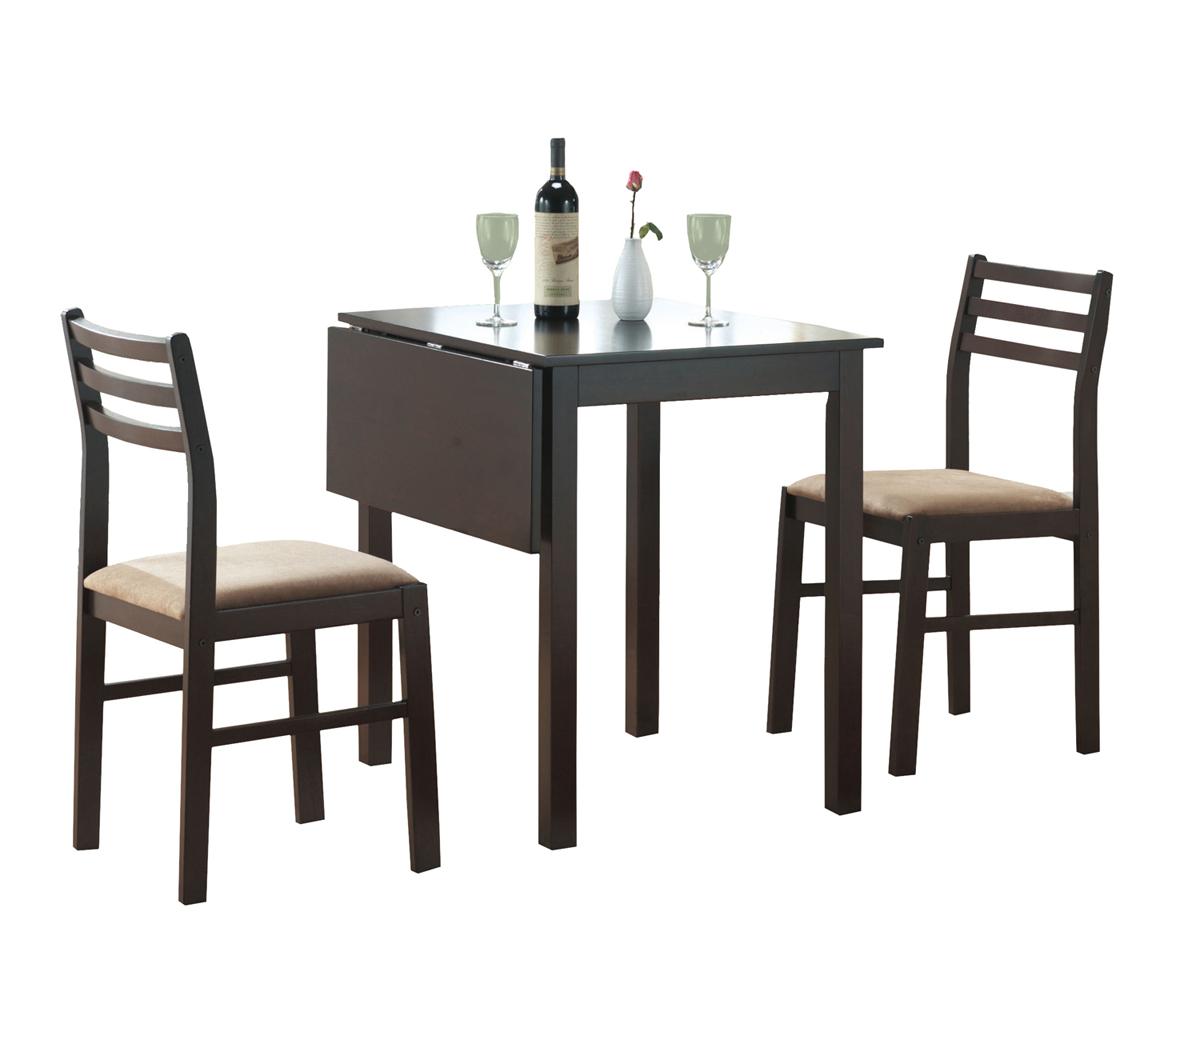 Dining Set - 3 Pieces Set / Cappuccino Solid-Top Drop Leaf